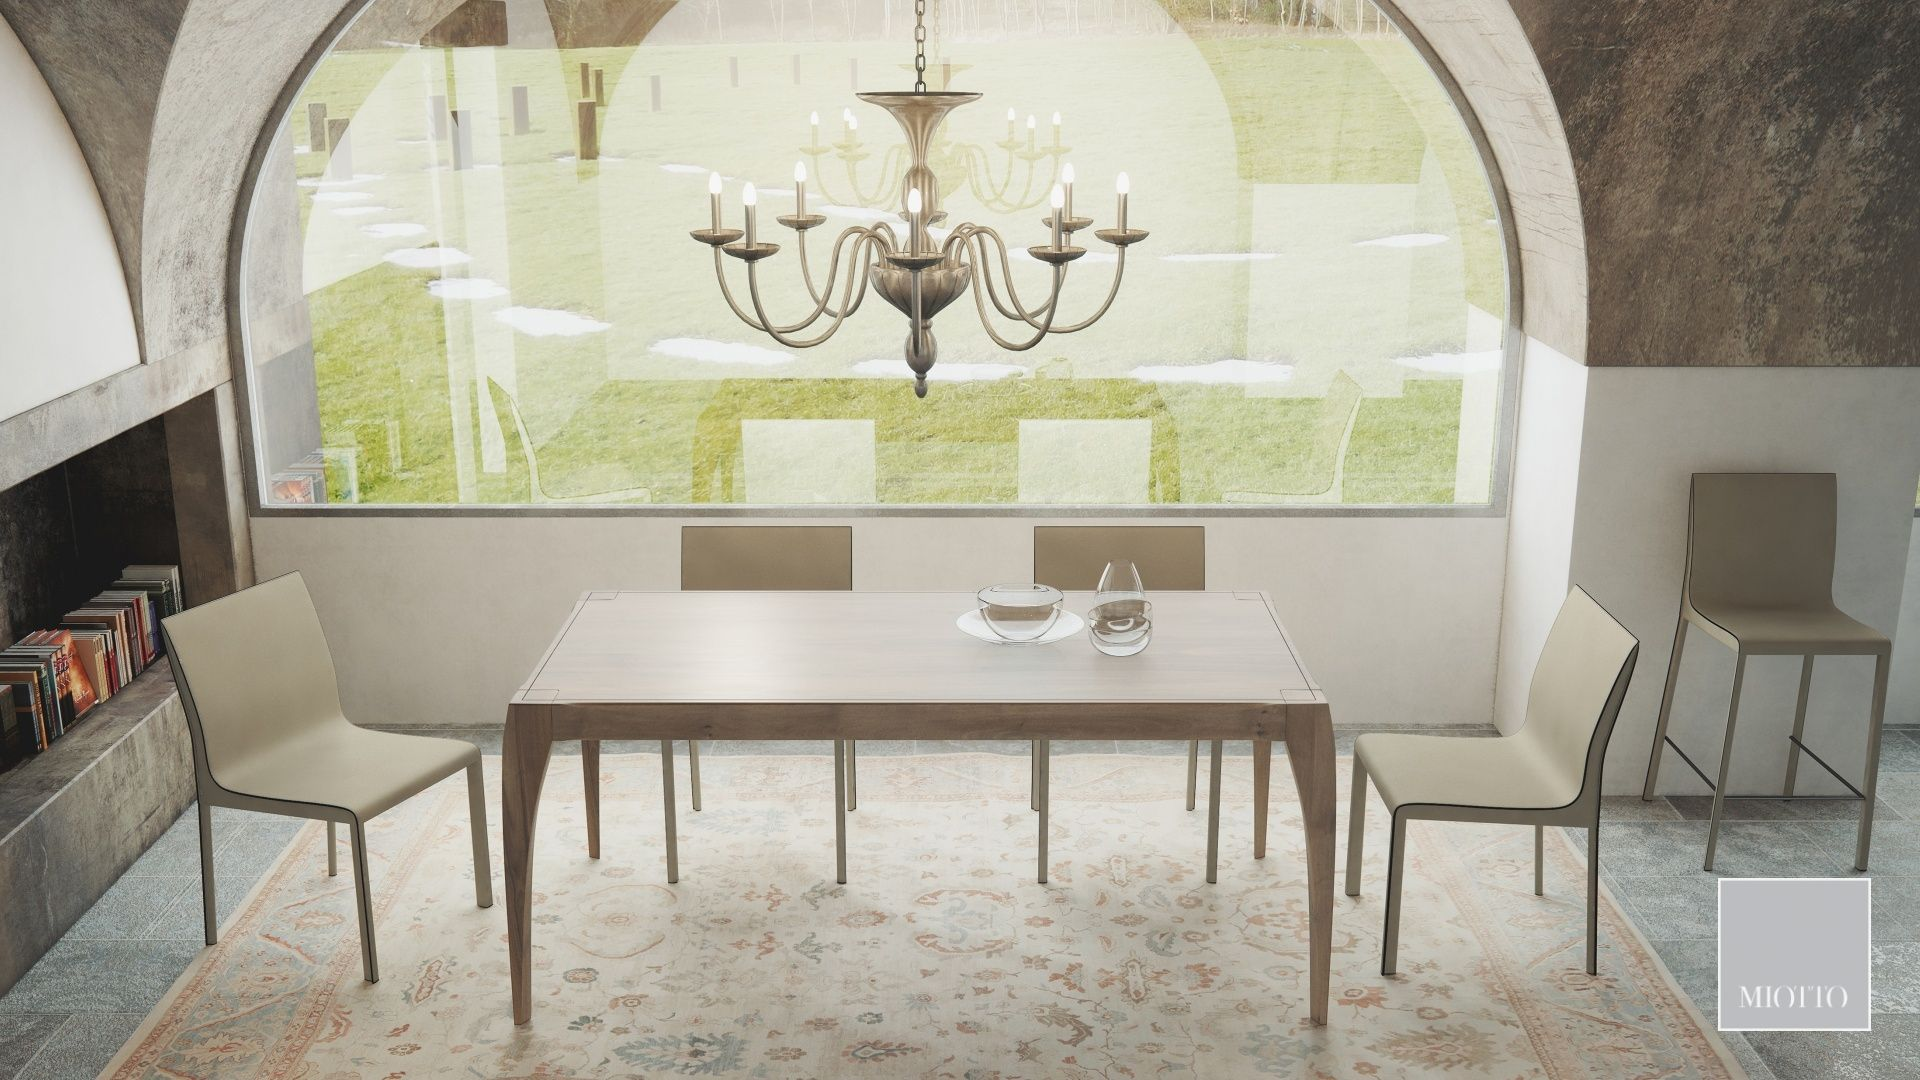 miotto_Breneta dining table walnut, ardini chair stool cream